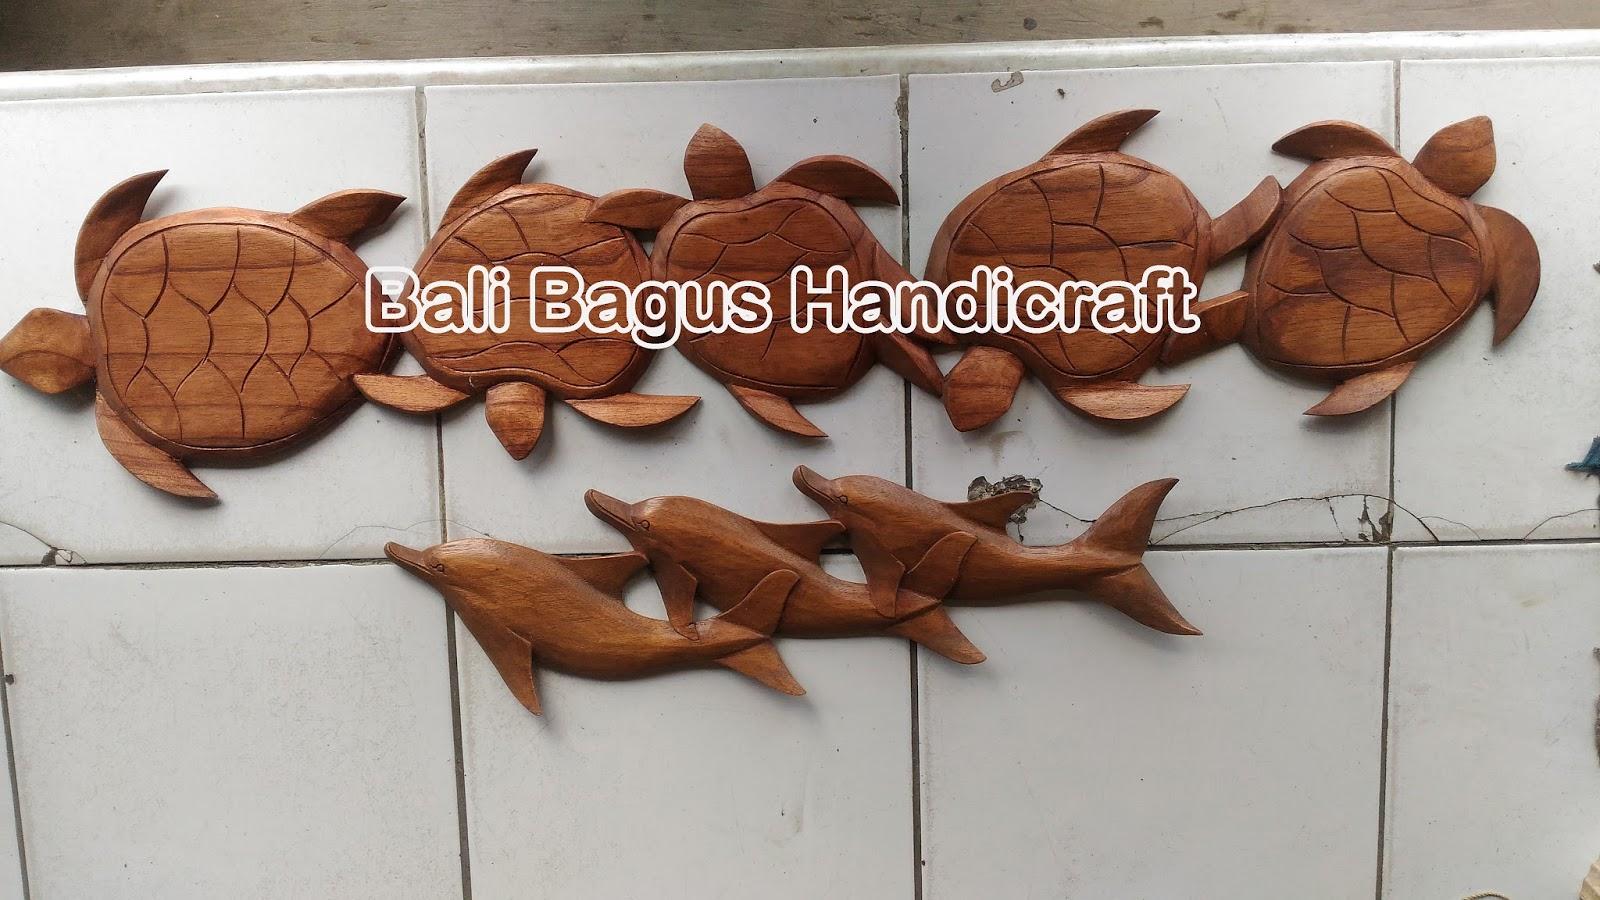 Bali Bagus Handicraft